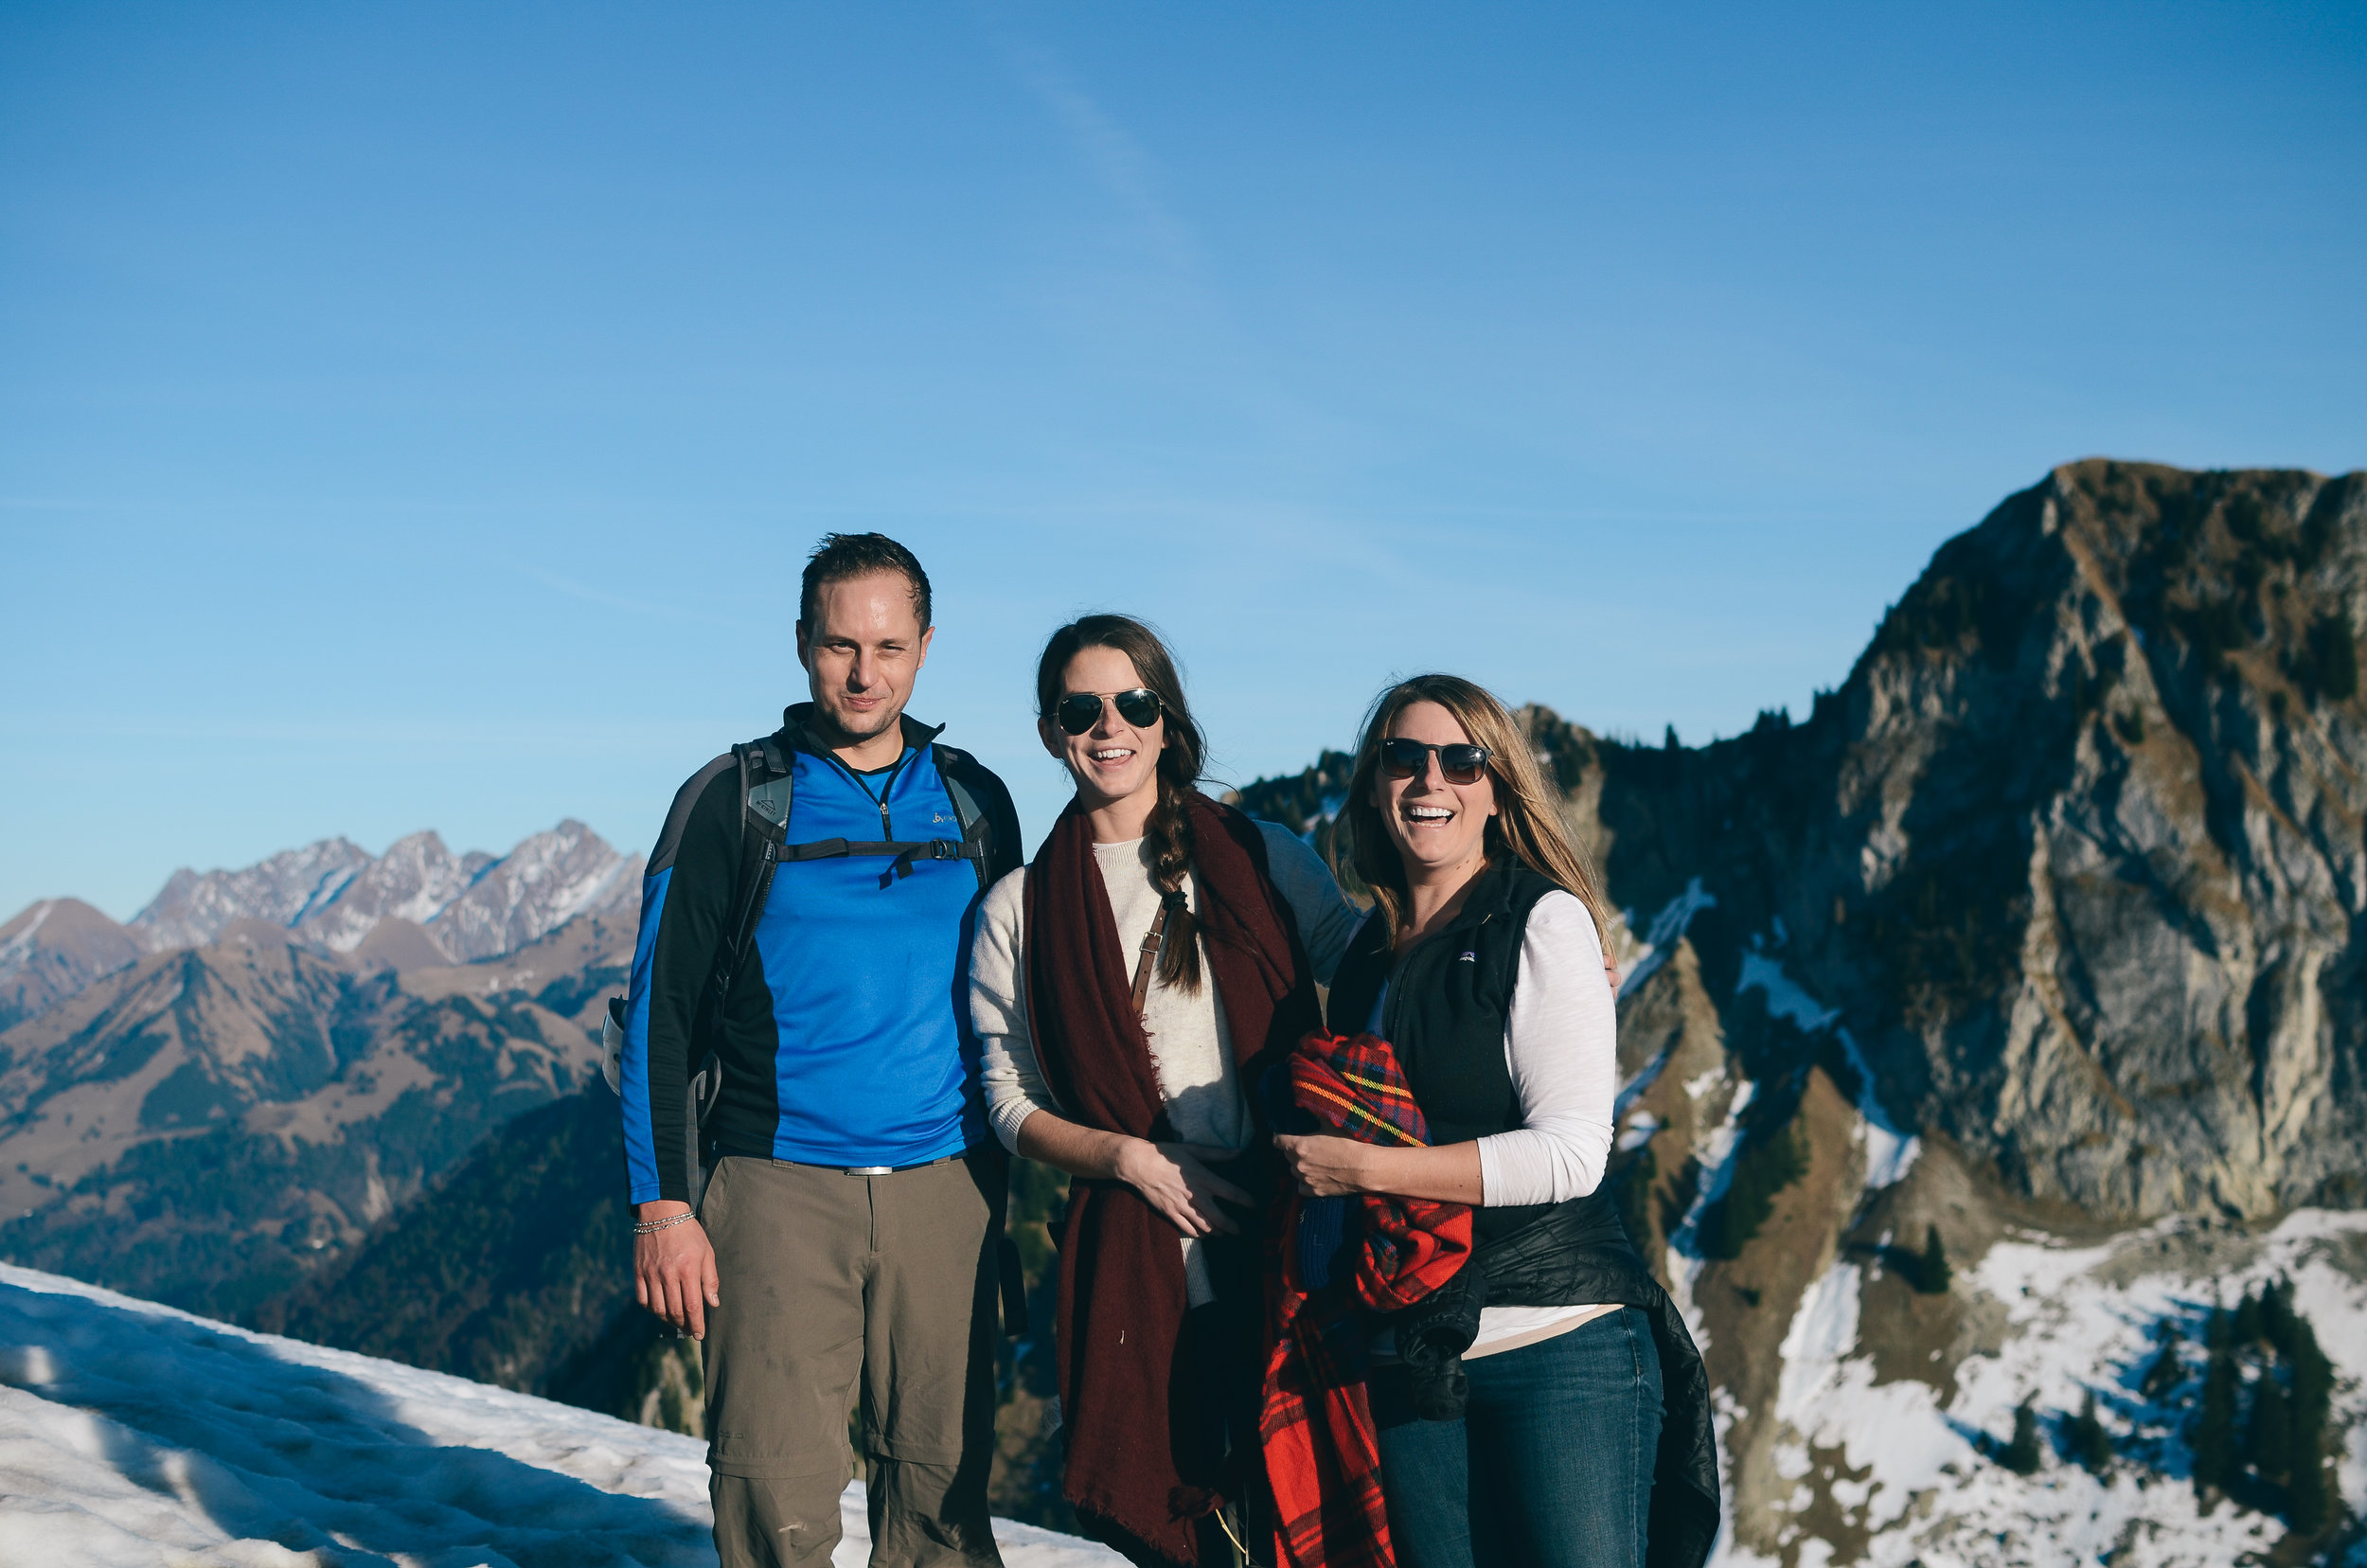 Switzerland-Day-Trips-From-Geneva-LifeOnPine_DSC_0662.jpg